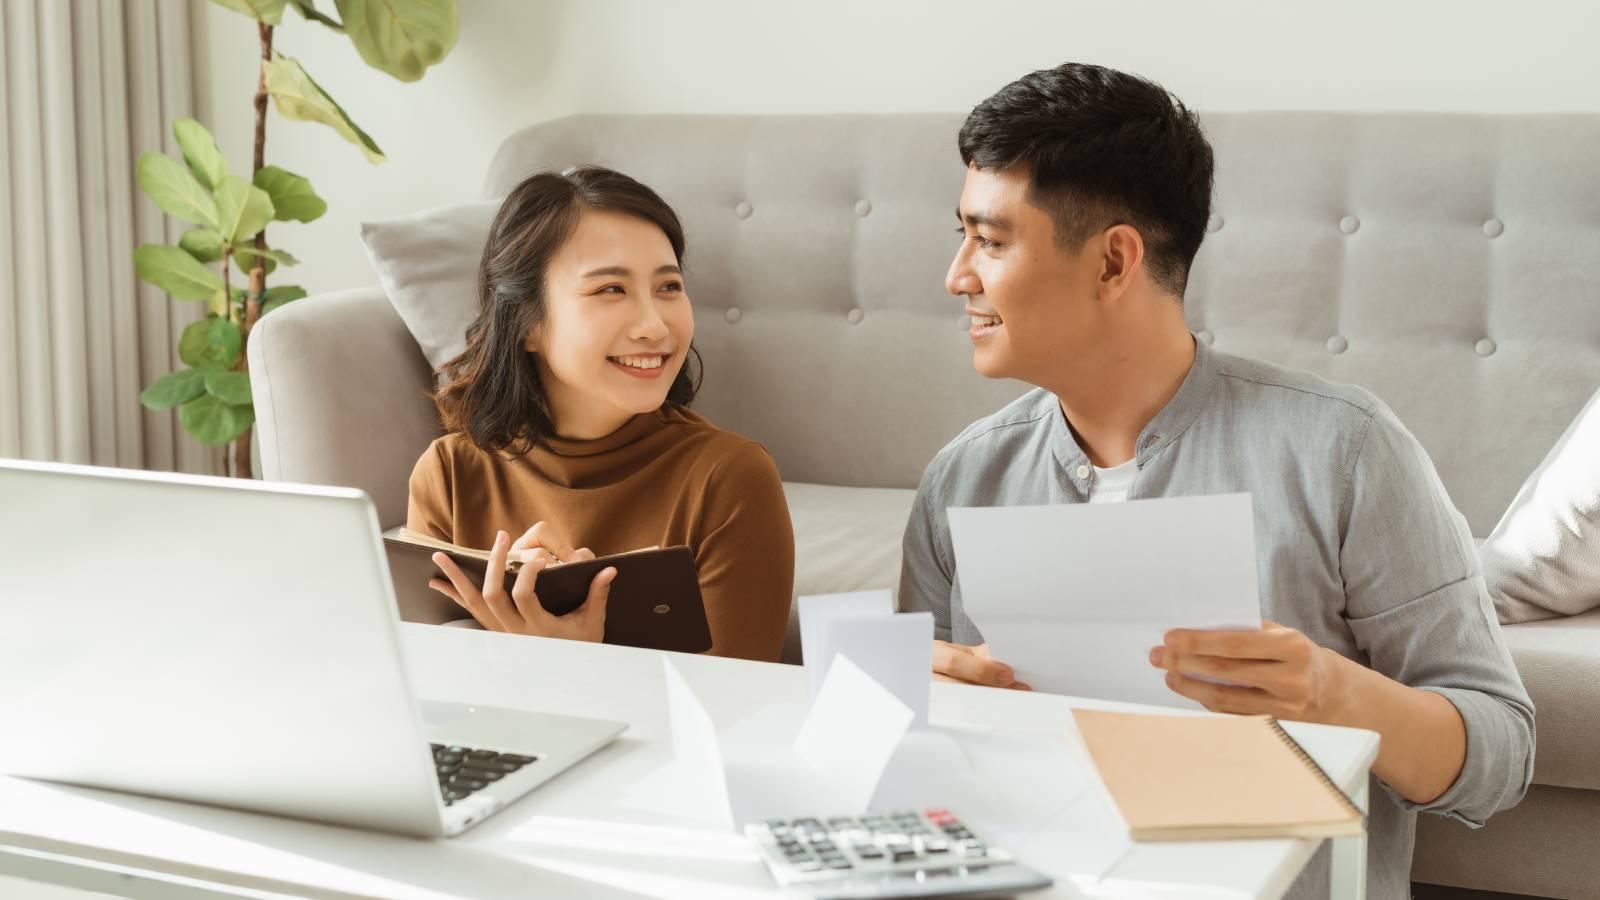 Long-Term Financial Goals: 6 Examples